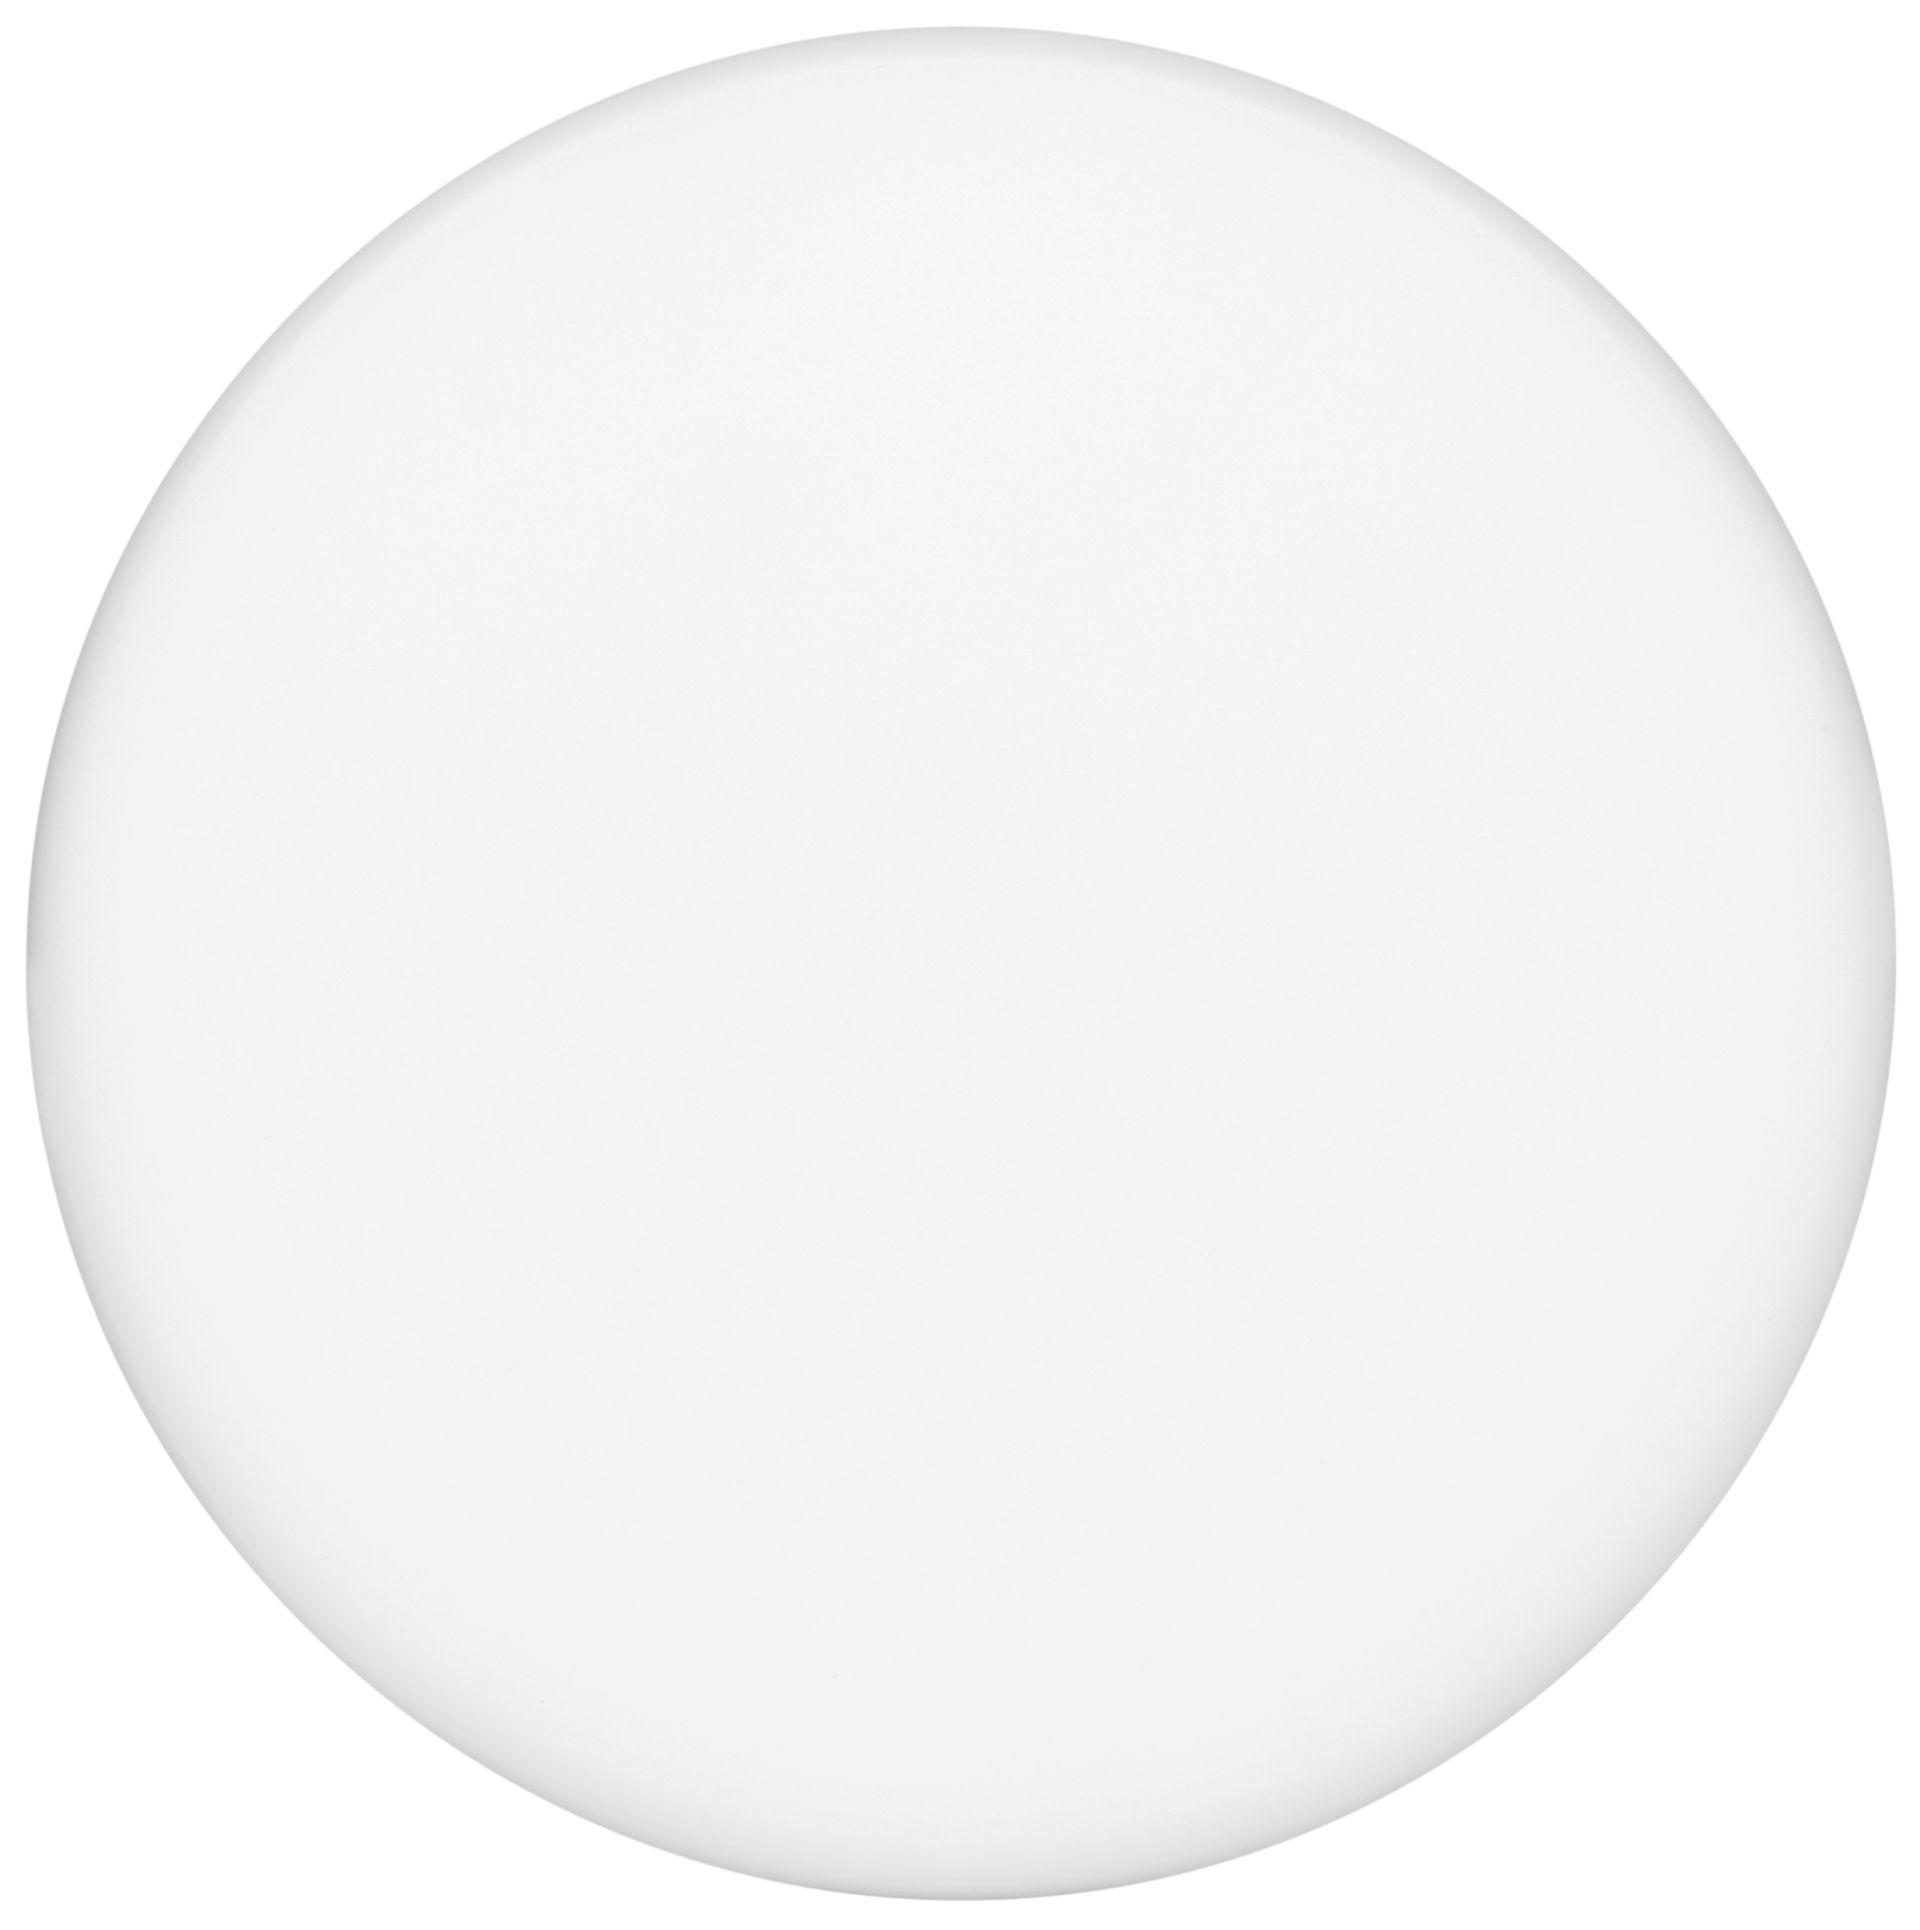 Ecolite Biely vstavaný LED panel guľatý 185mm 22W IP66 LED-NR-22W/IP66